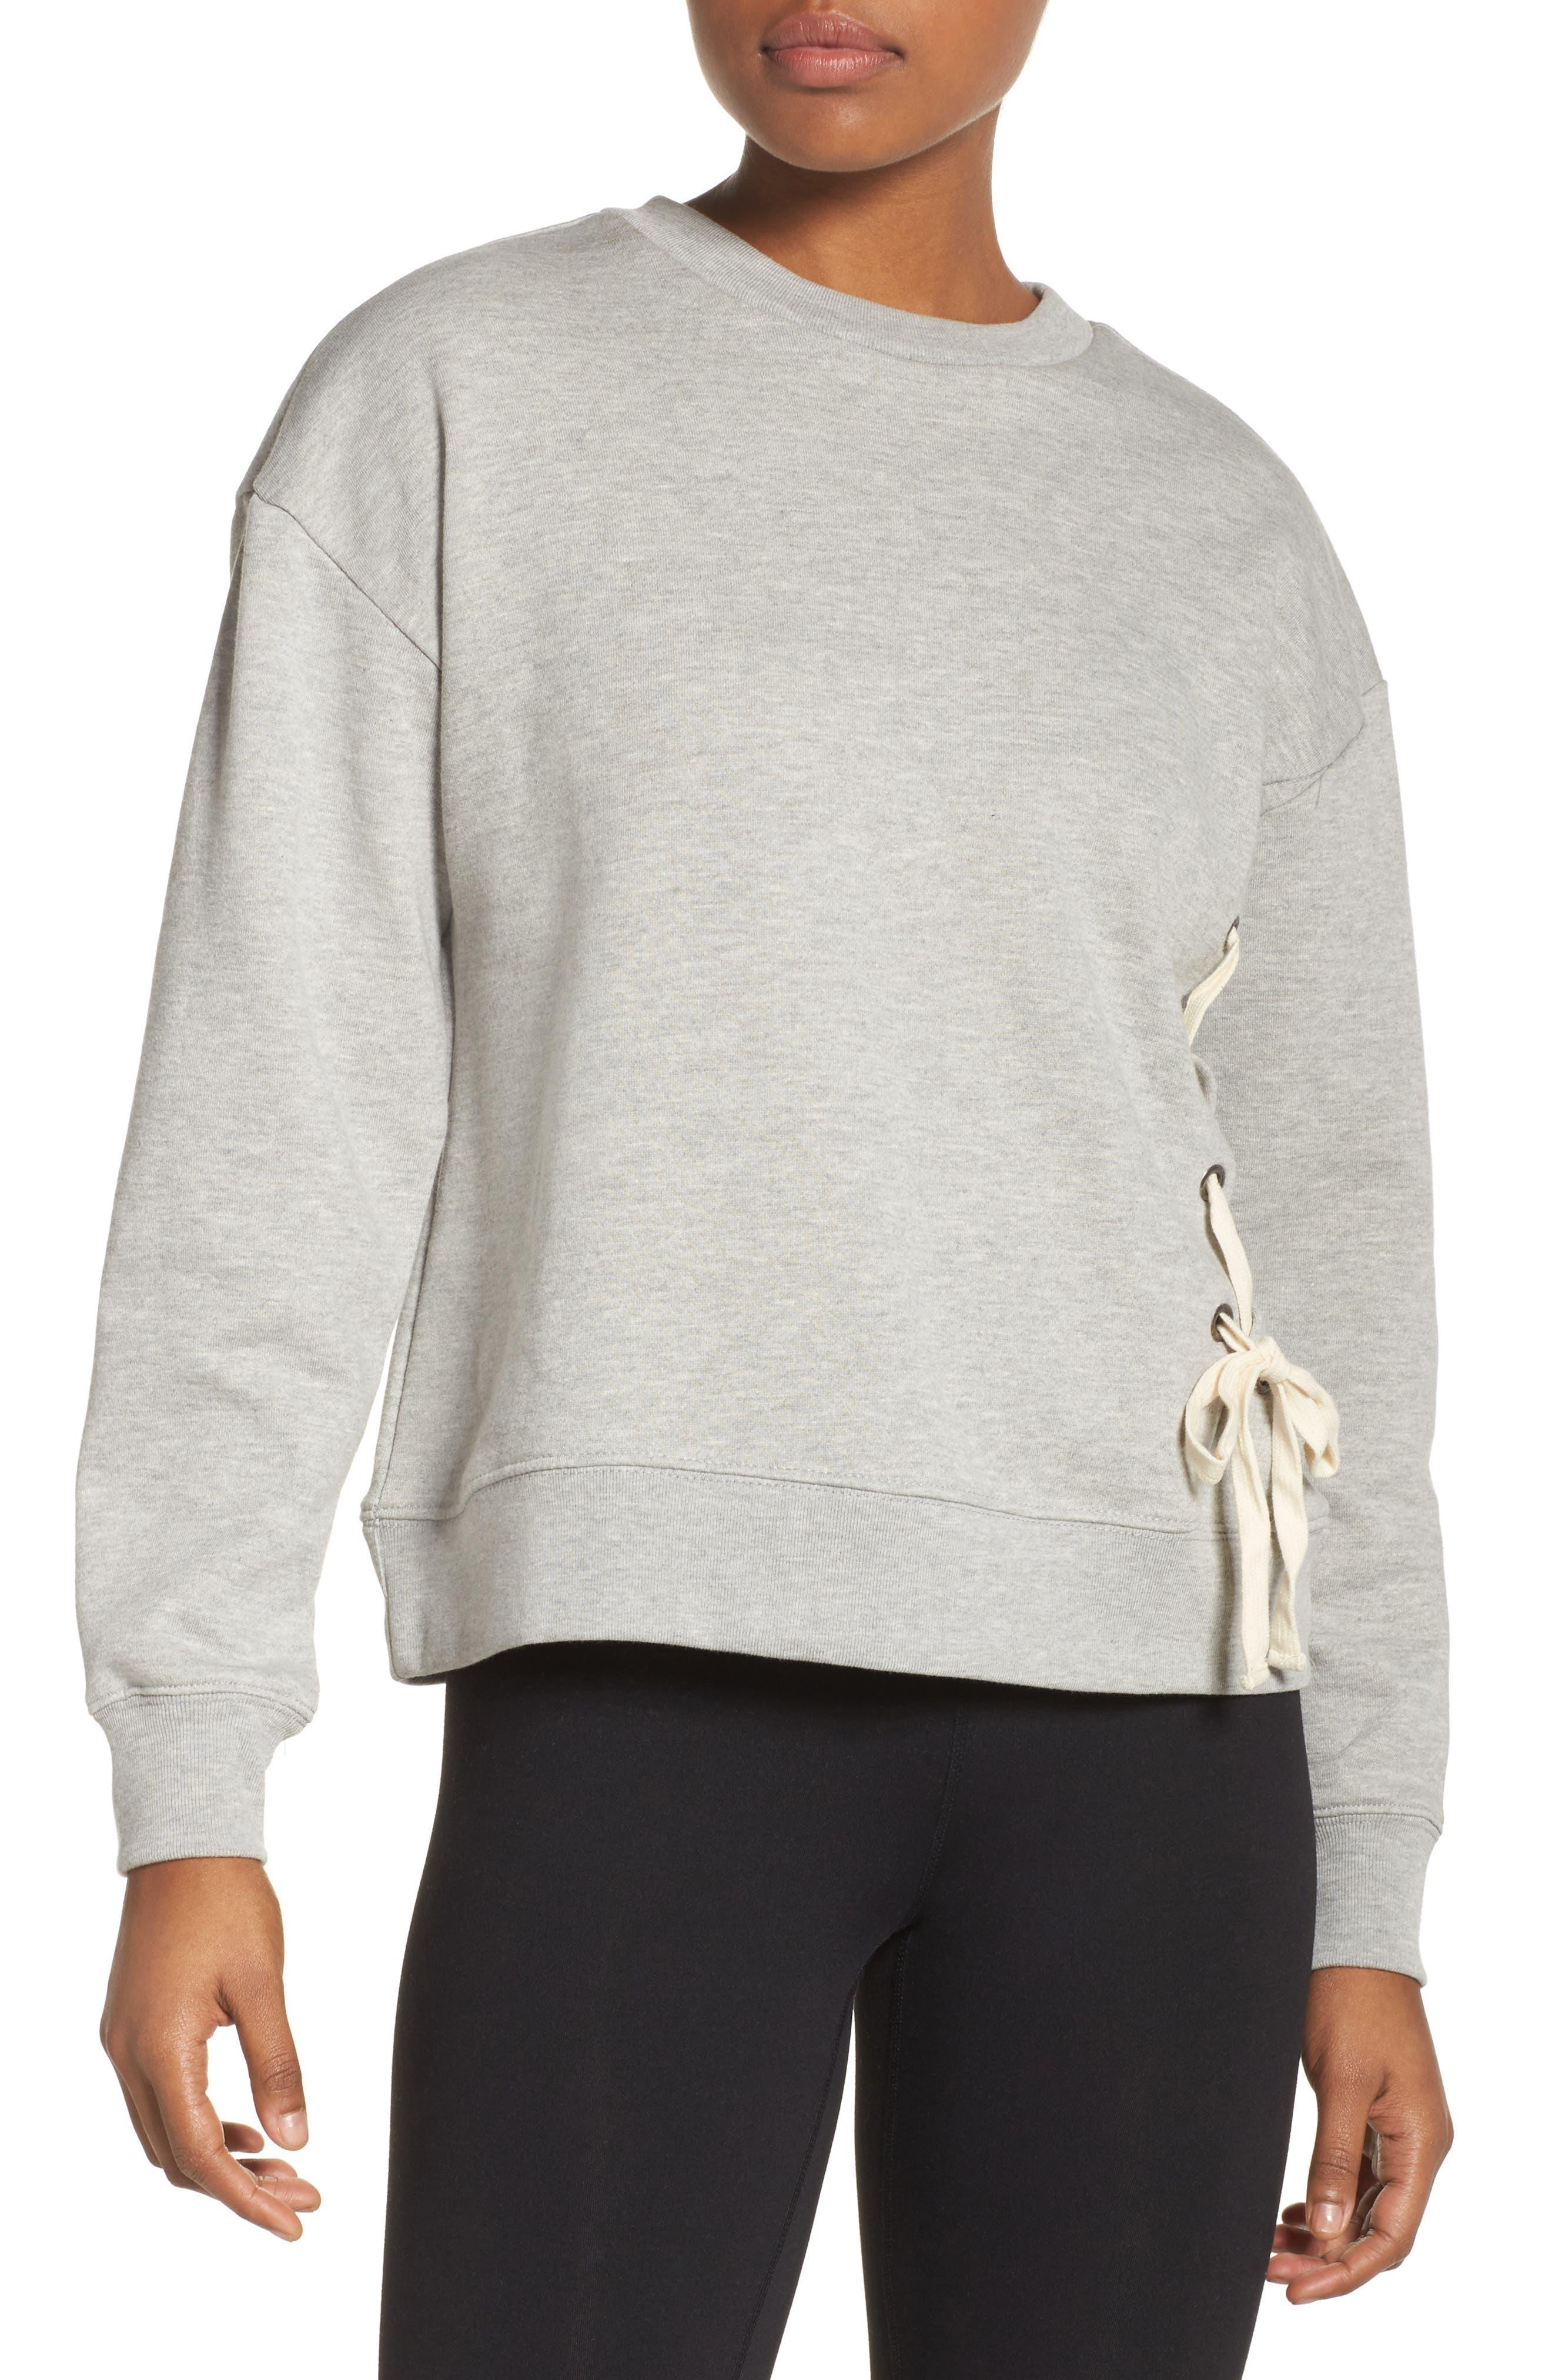 Main Image - Zella Lace-Up Crewneck Sweatshirt